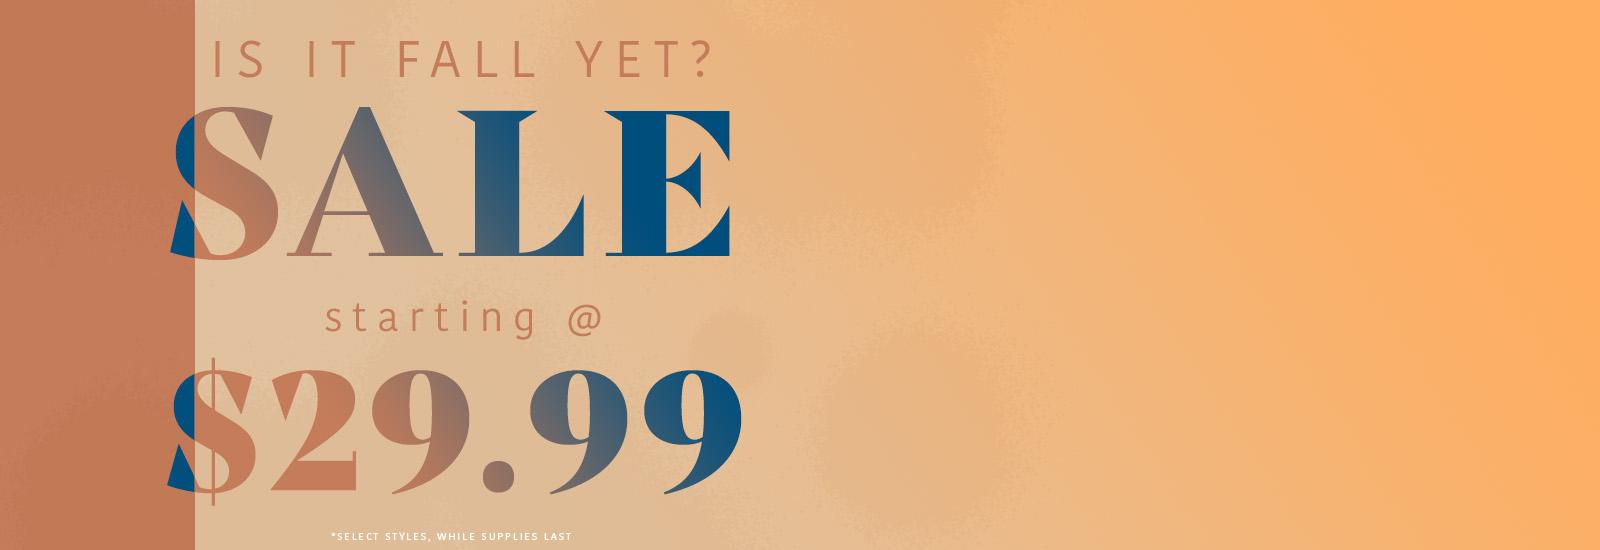 Sale starting at $29.99